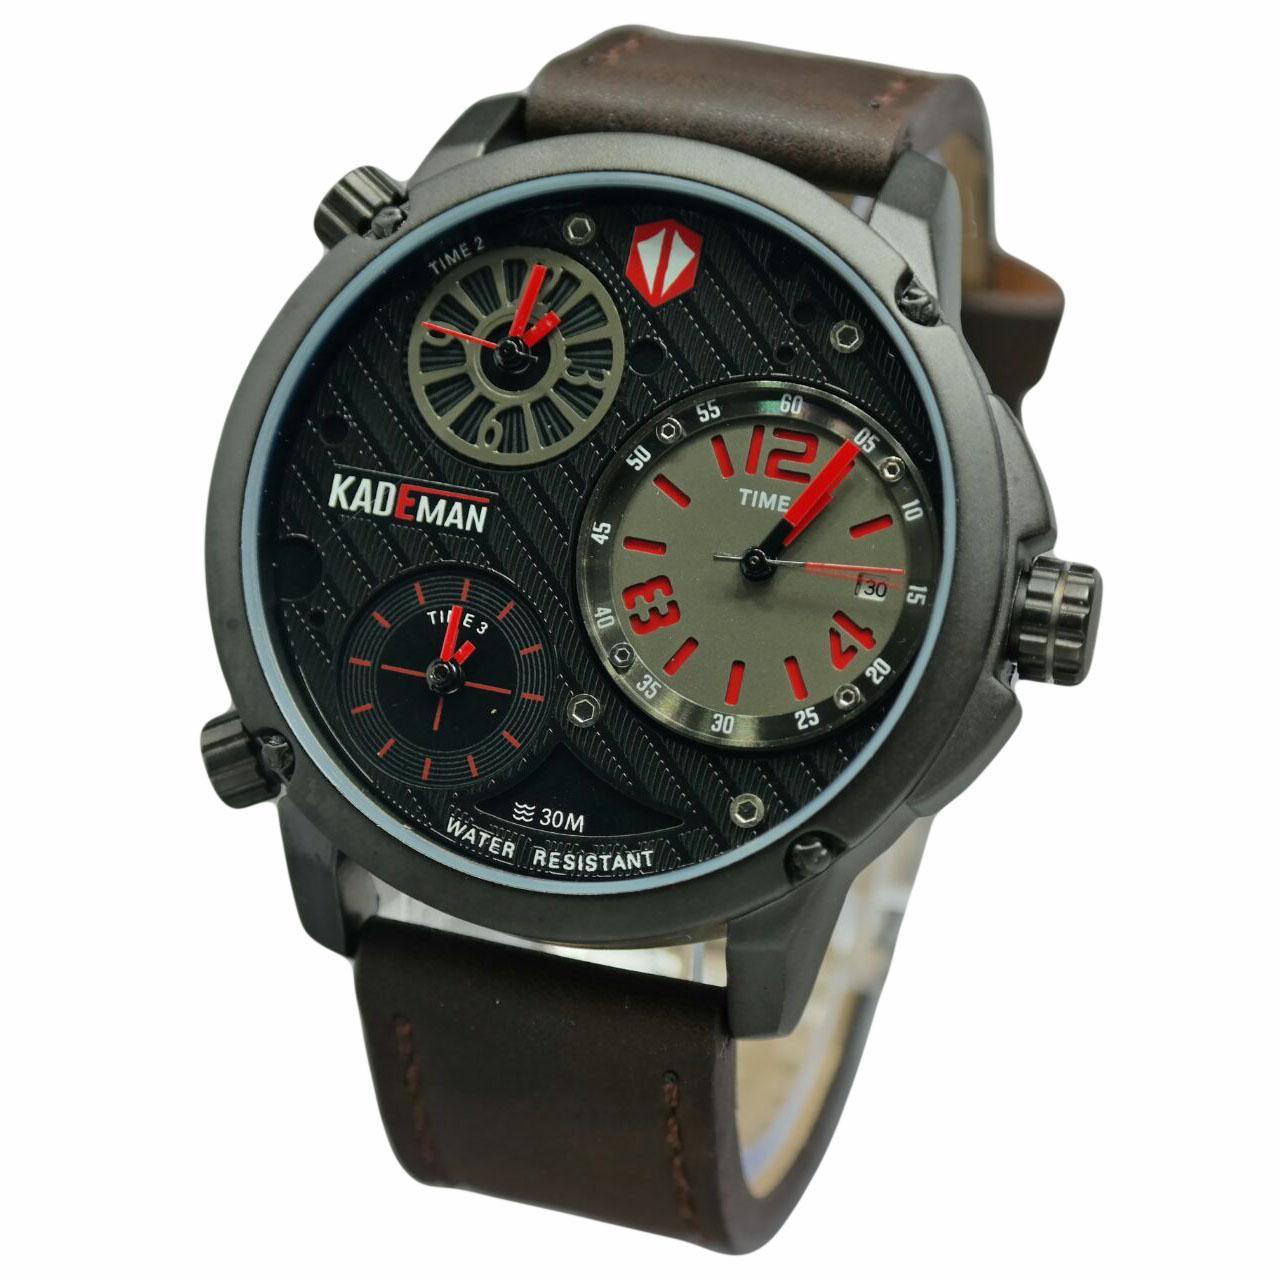 Kademan D48H170KD3001CKTTMR Triple Time Leather Strap Jam Tangan Pria Coklat Tua Merah